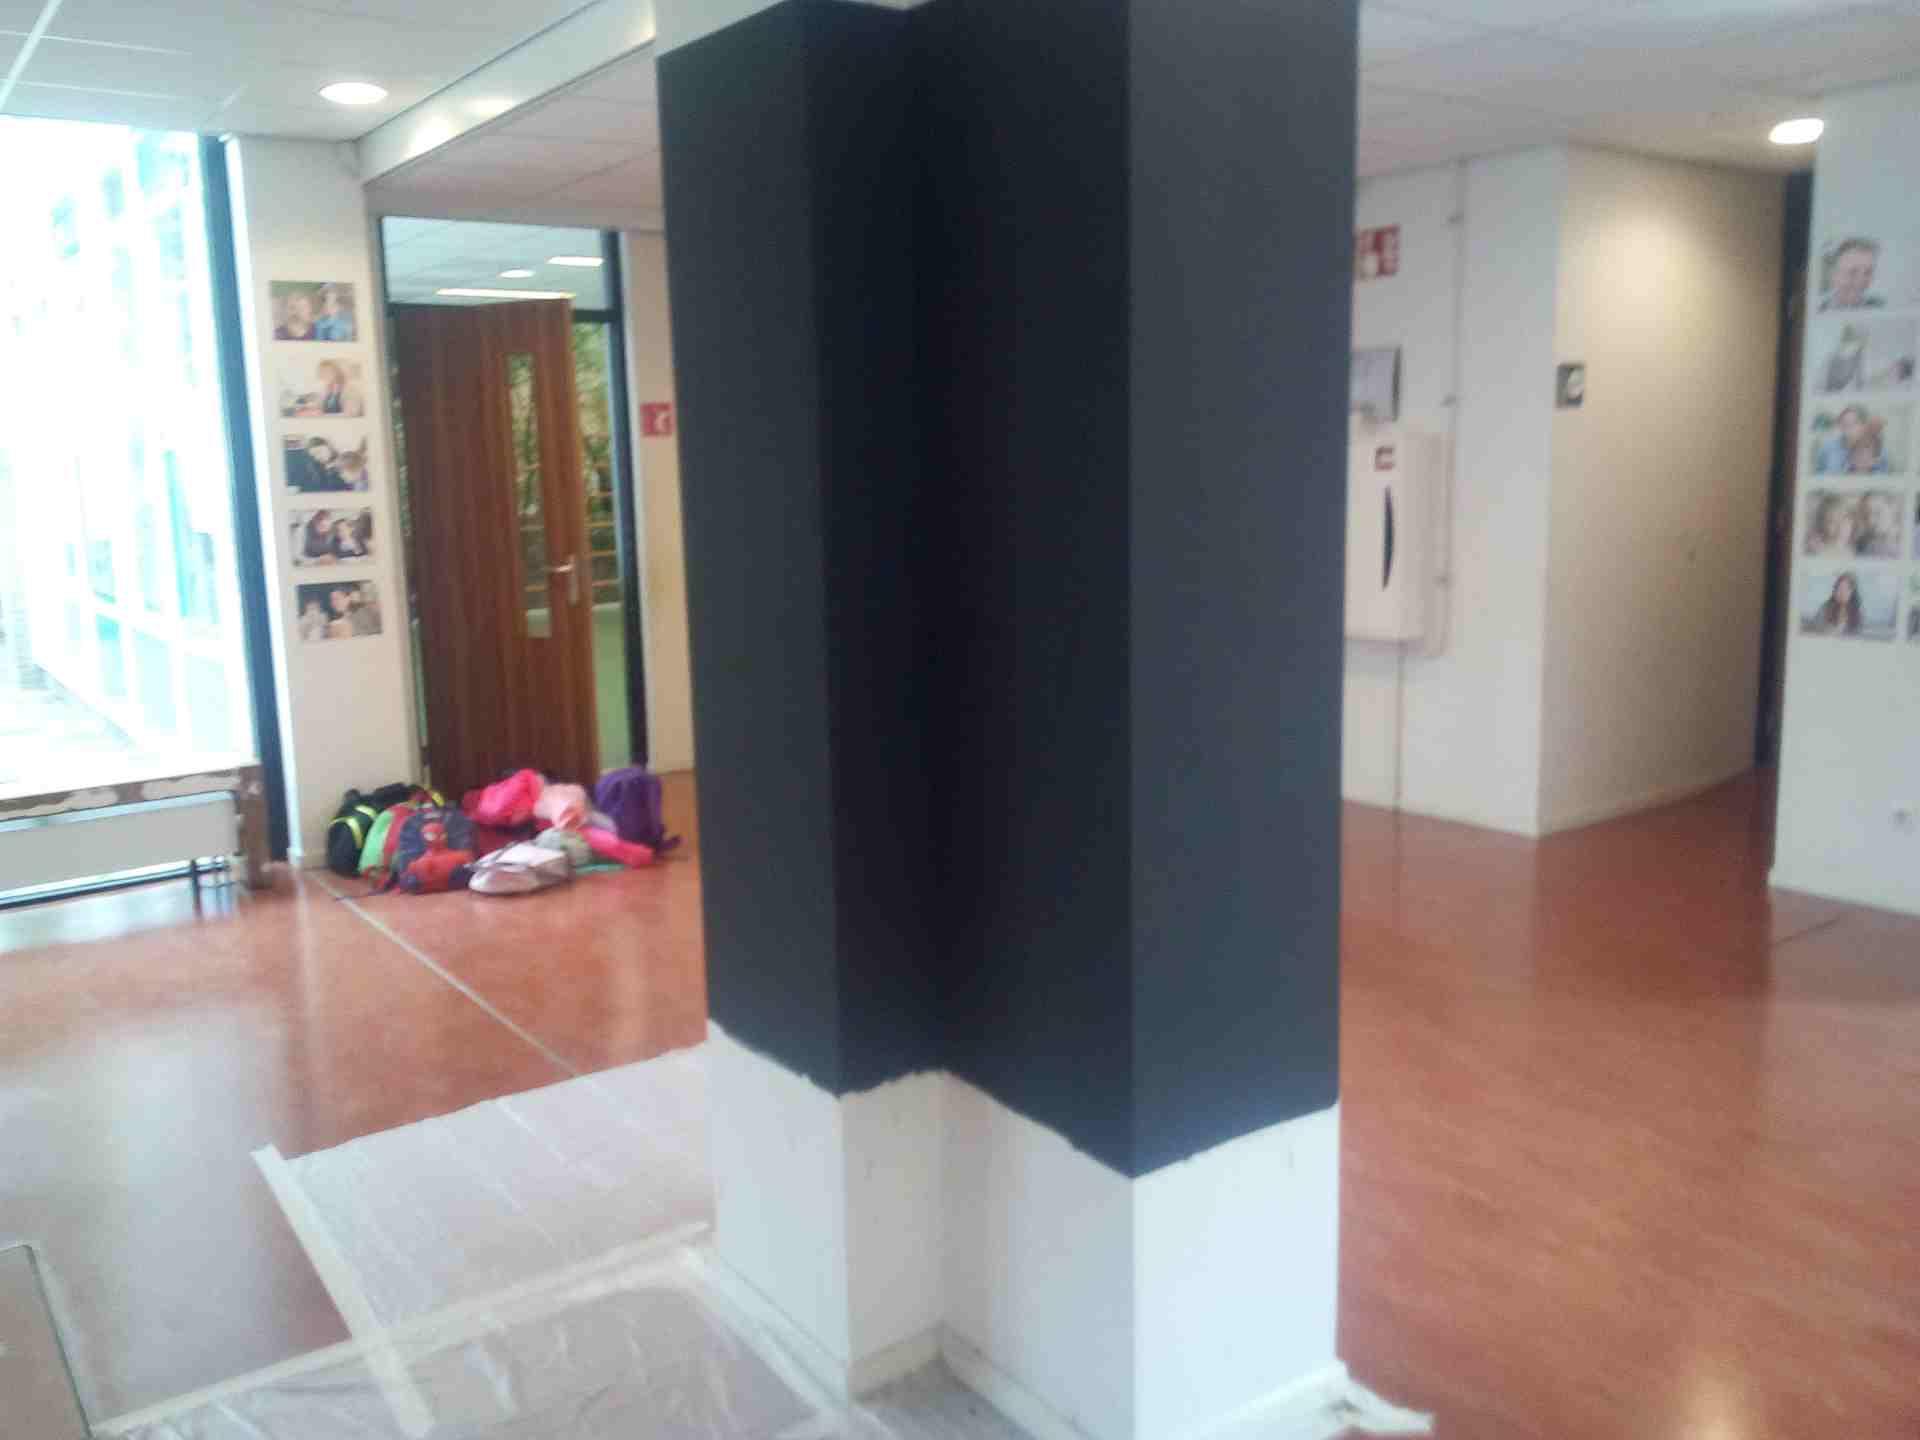 Afbeelding: muurtje met magneetverf op school.